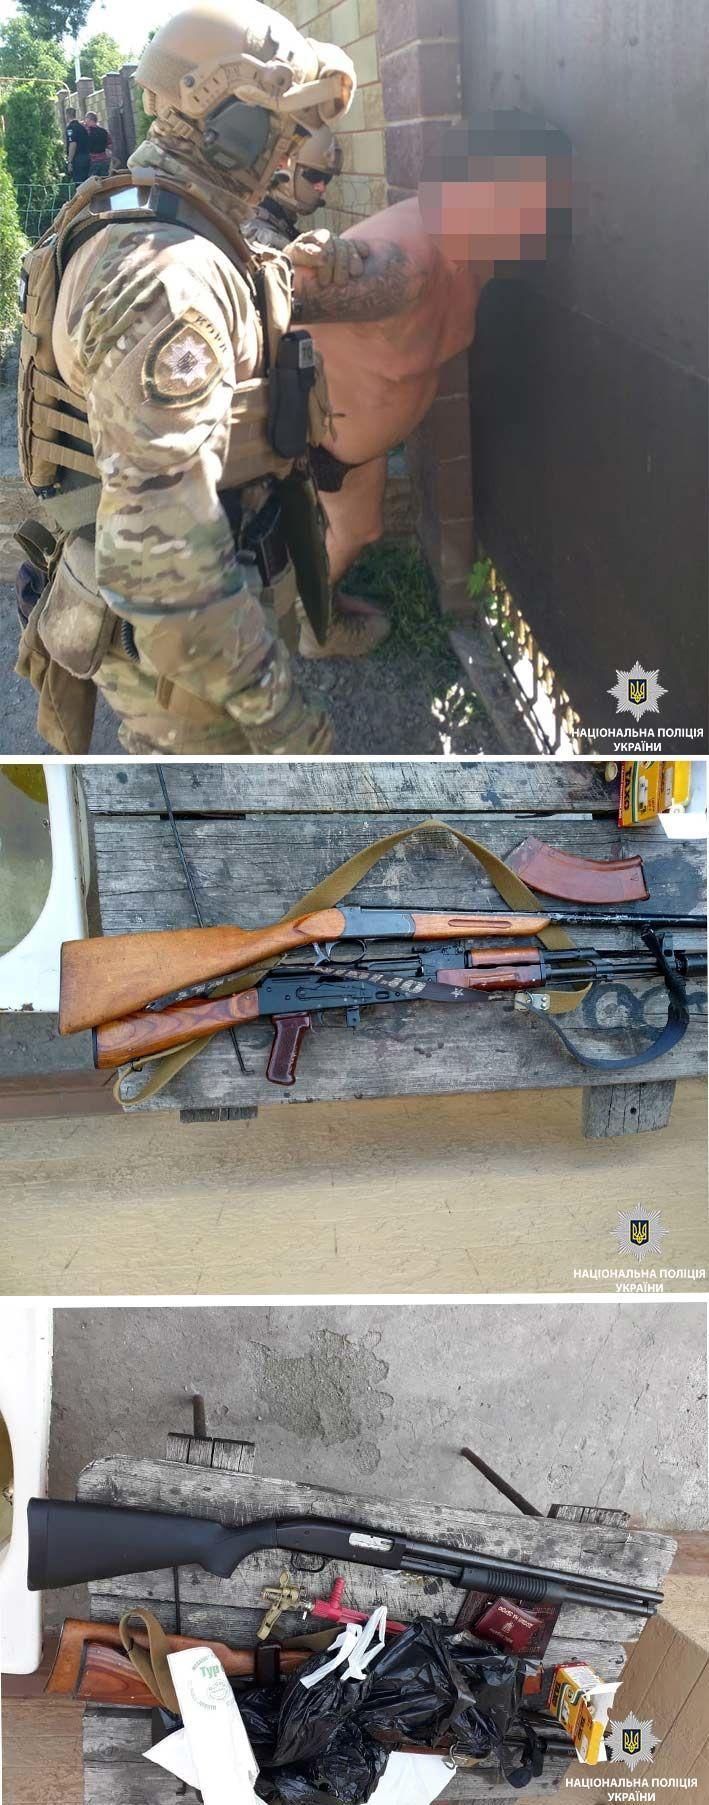 Поліція Дніпра затримала стрільців